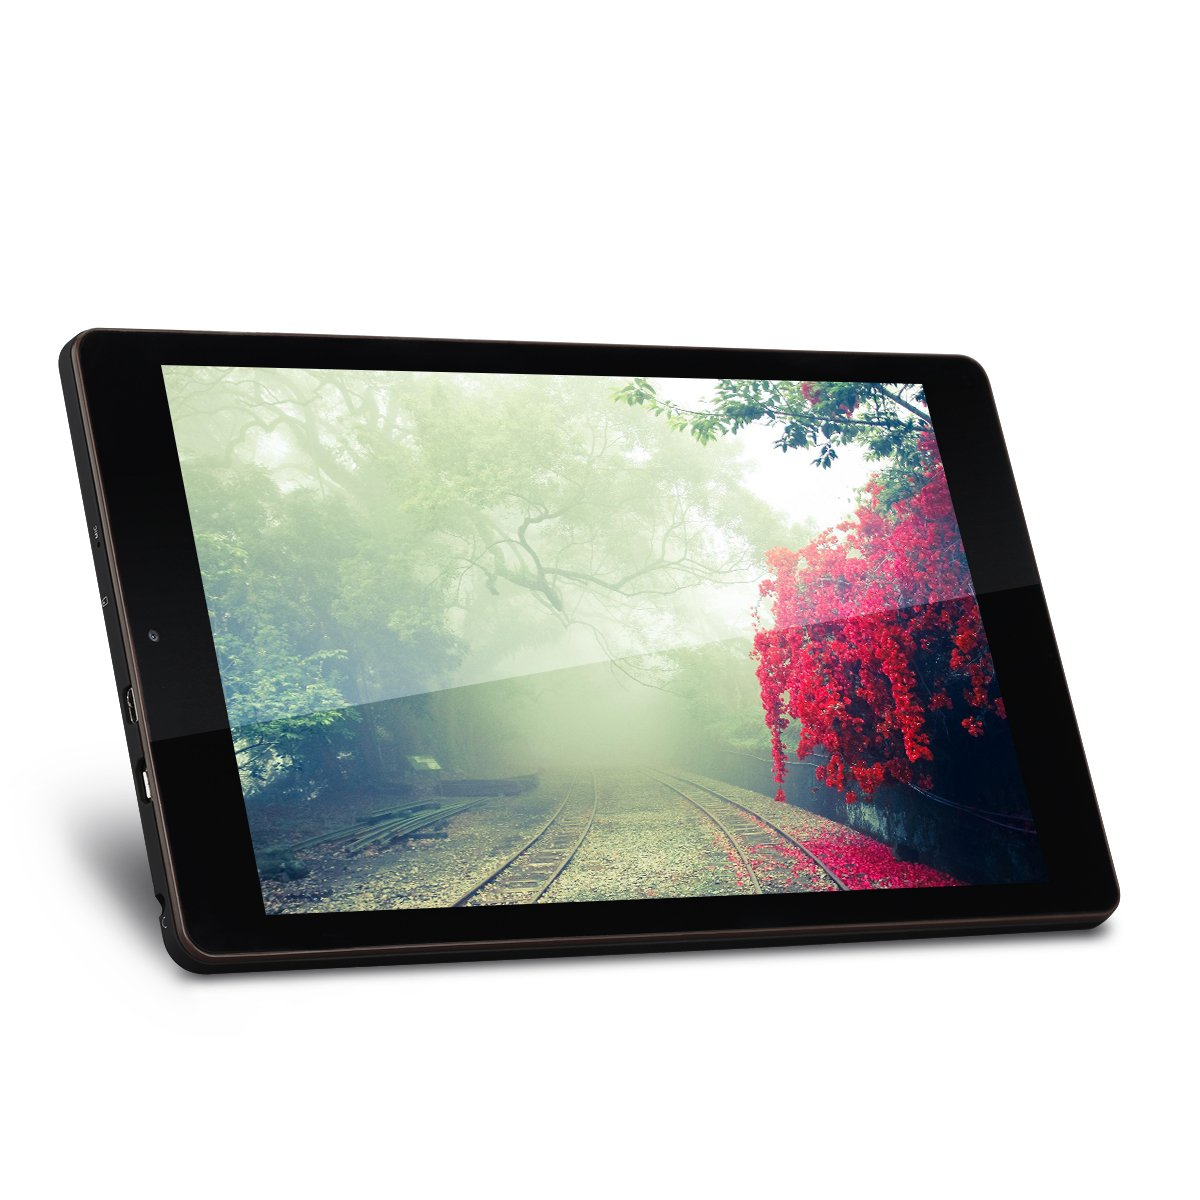 "Nextbook Flexx8 Windows 10 8"" 1280x800 Intel Z3735G 1GB+16GB Dual Camera WiFi Bluetooth HDMI Tablet PC US"